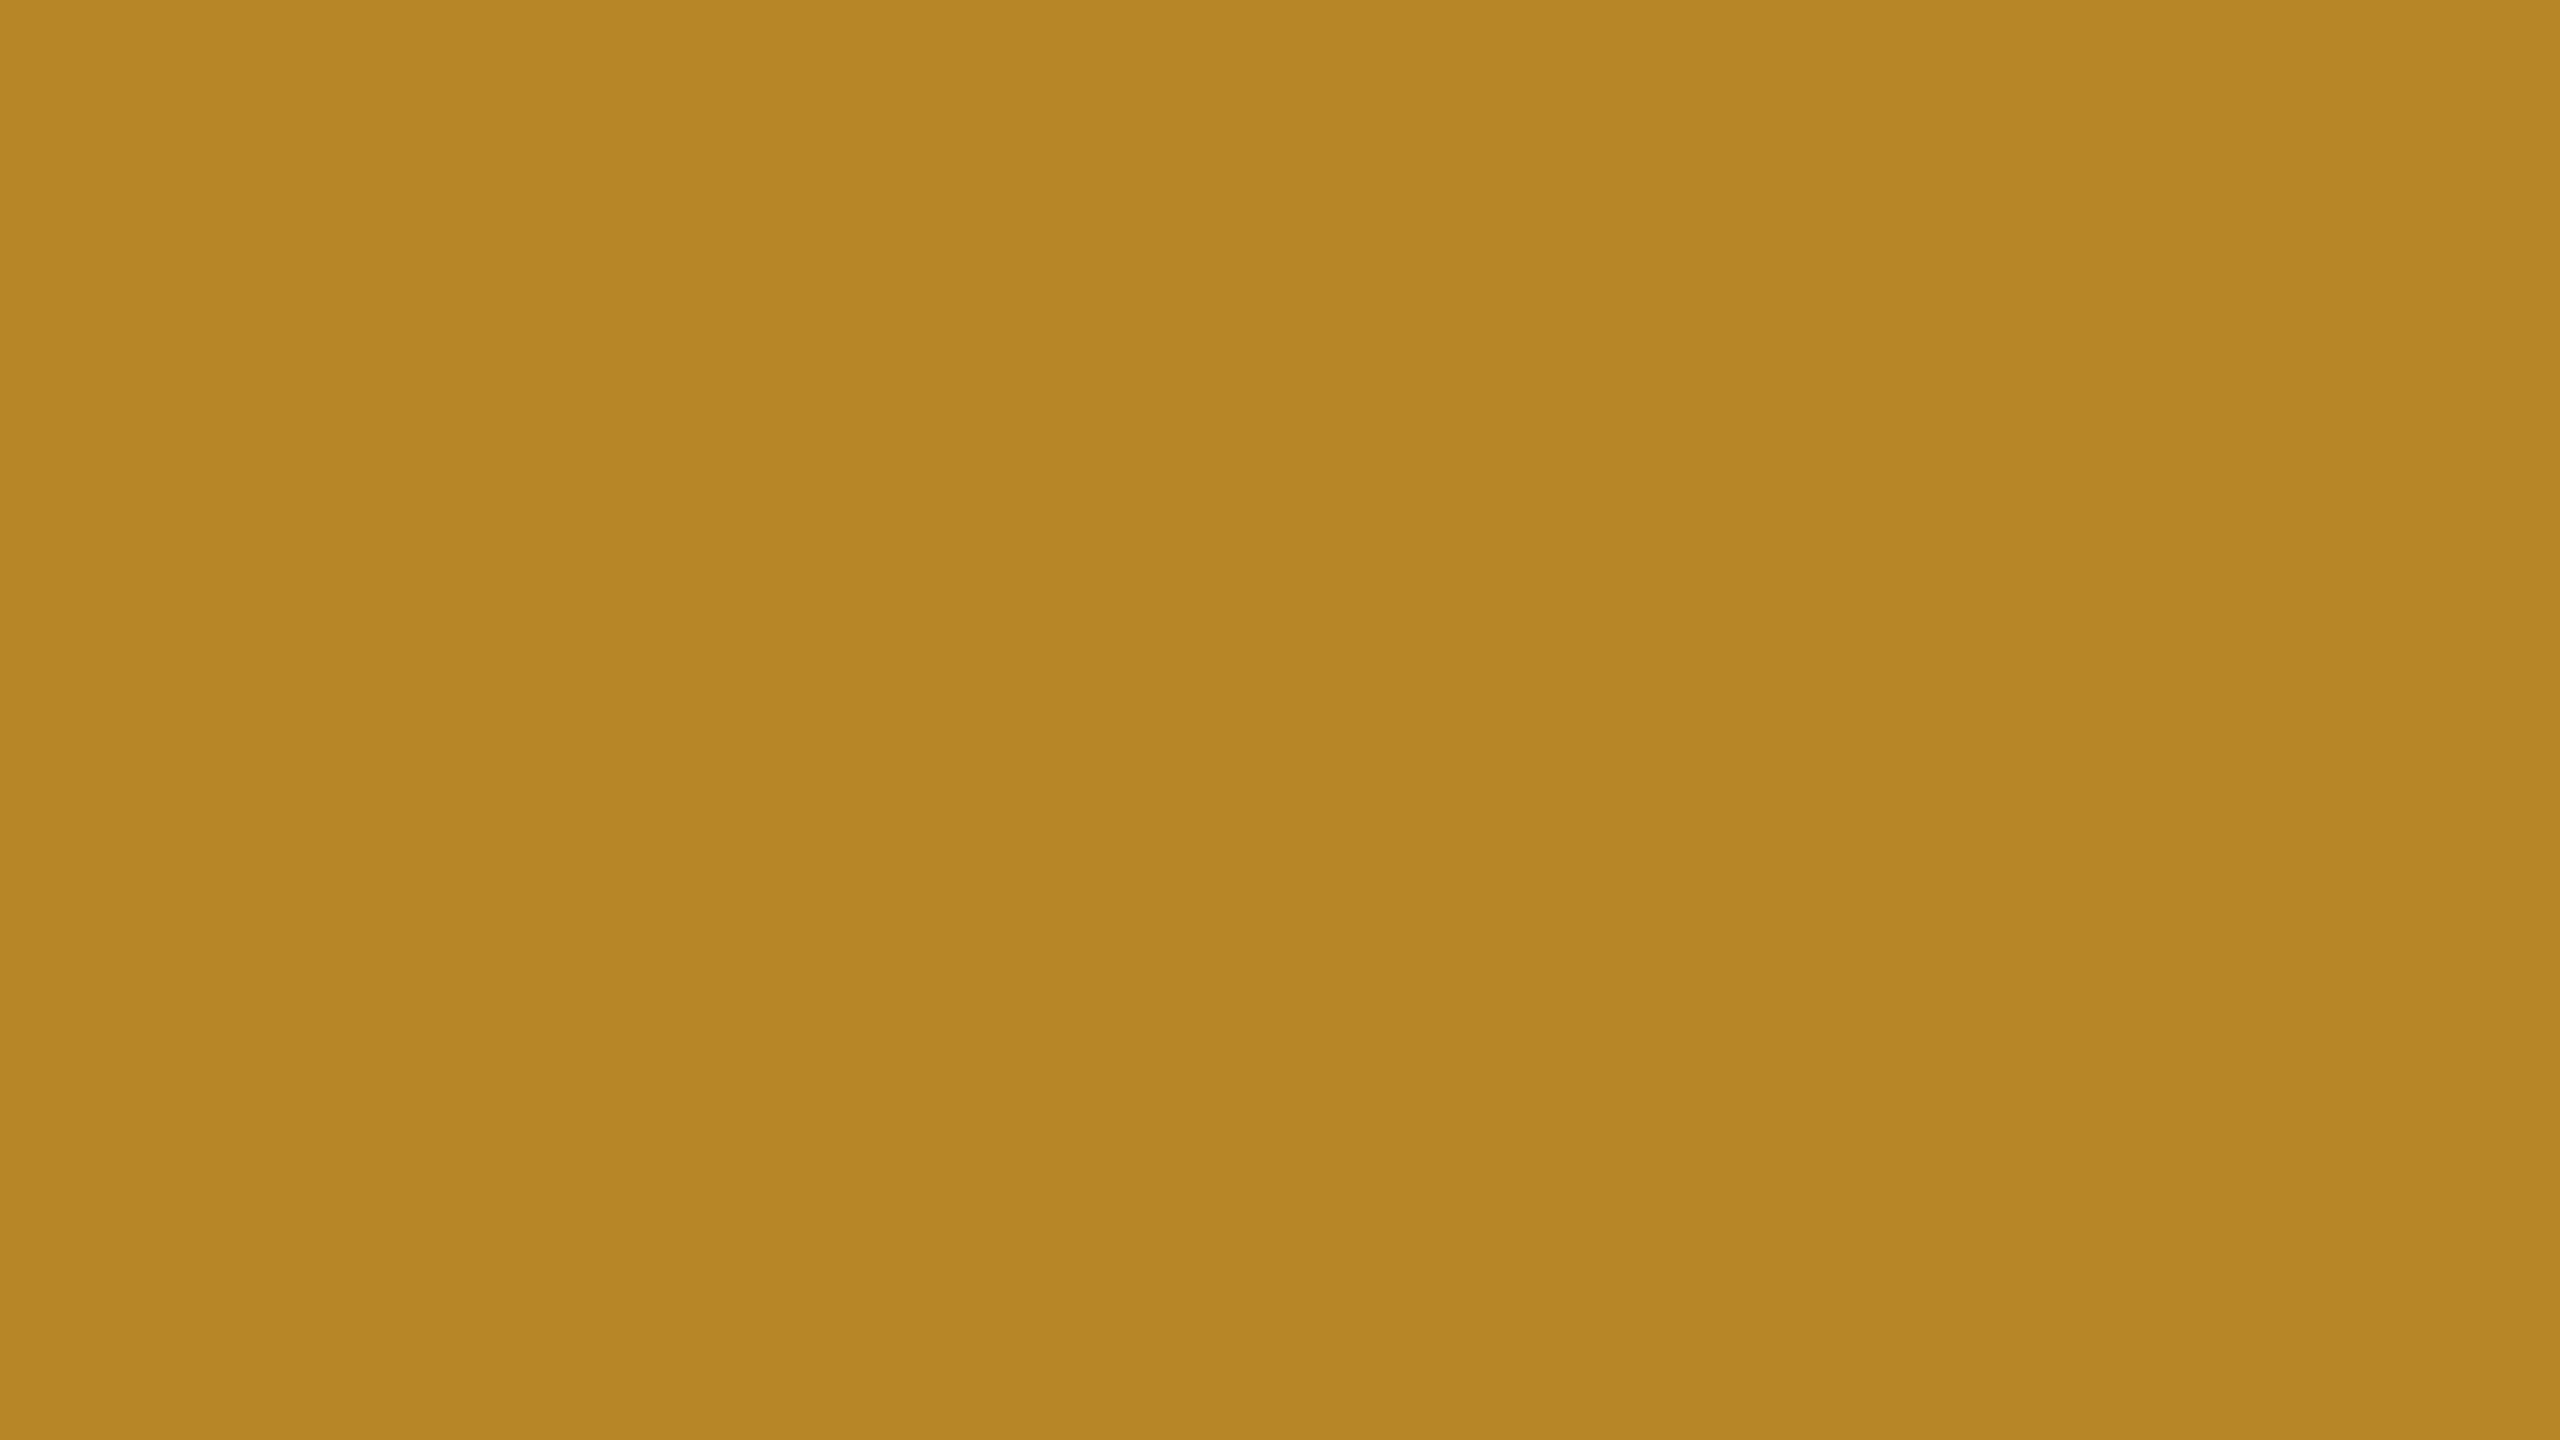 gold color background wallpapersafari